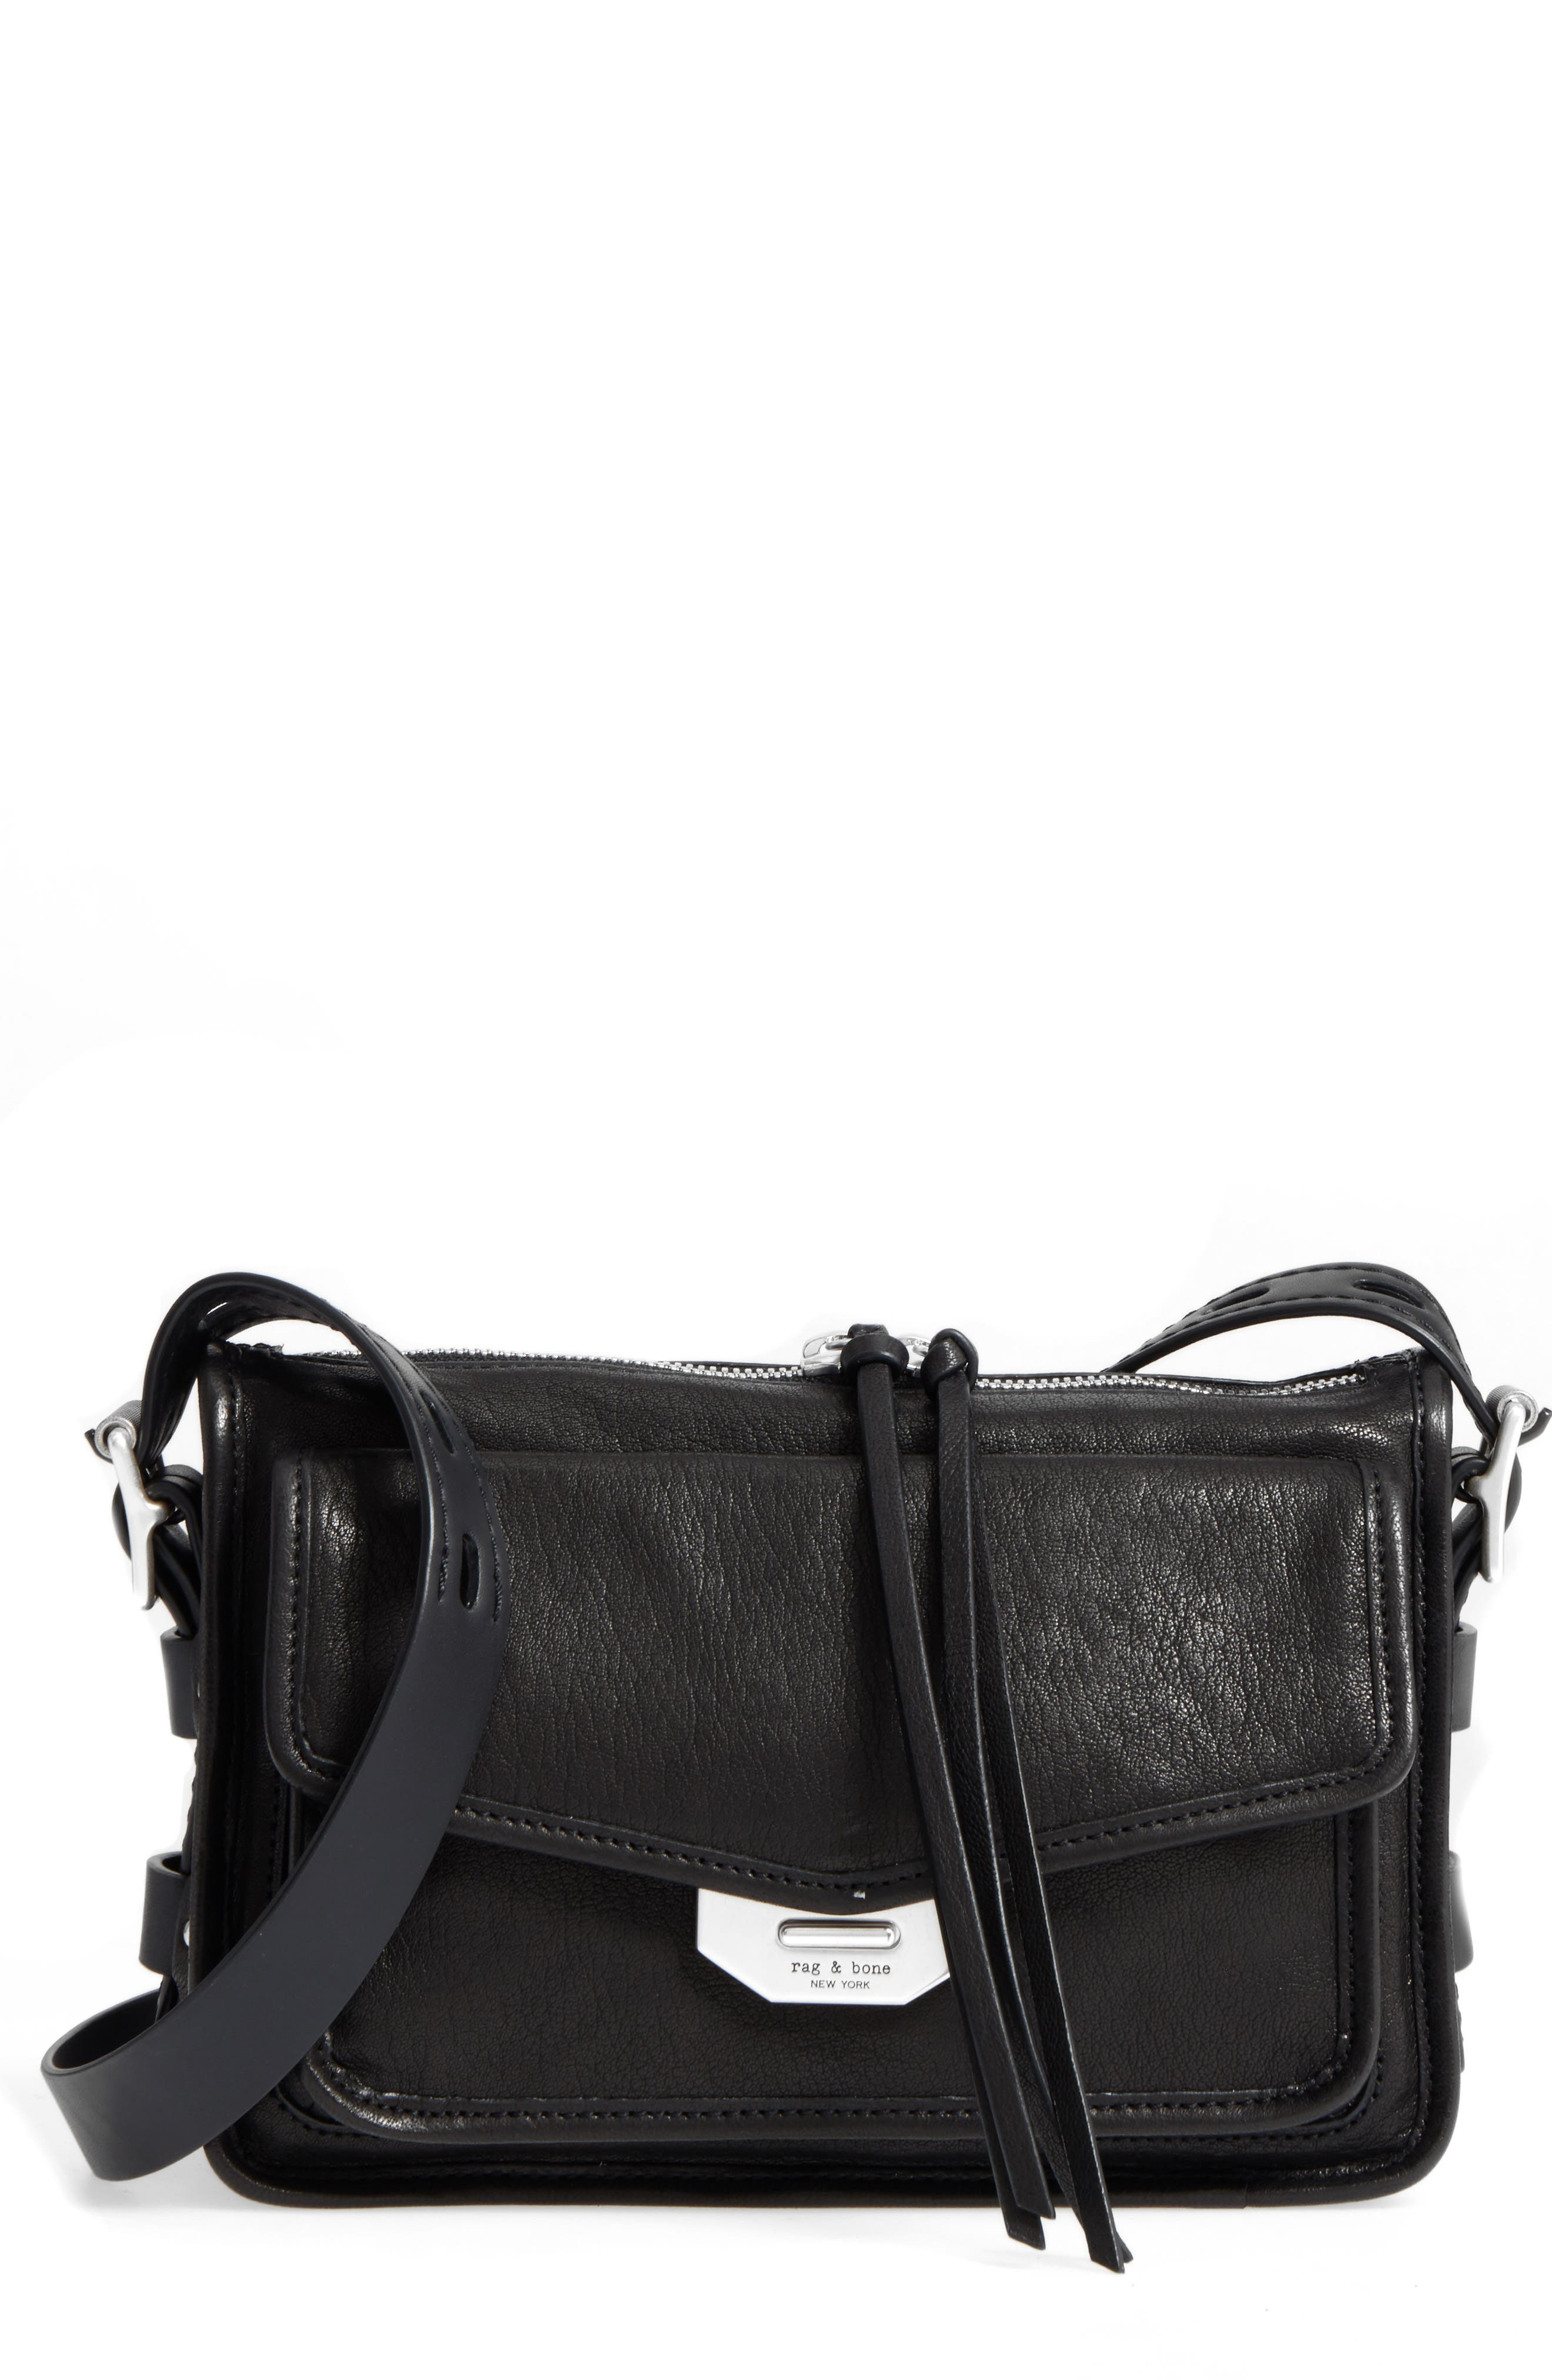 Rag Amp Bone Small Field Leather Messenger Bag Black